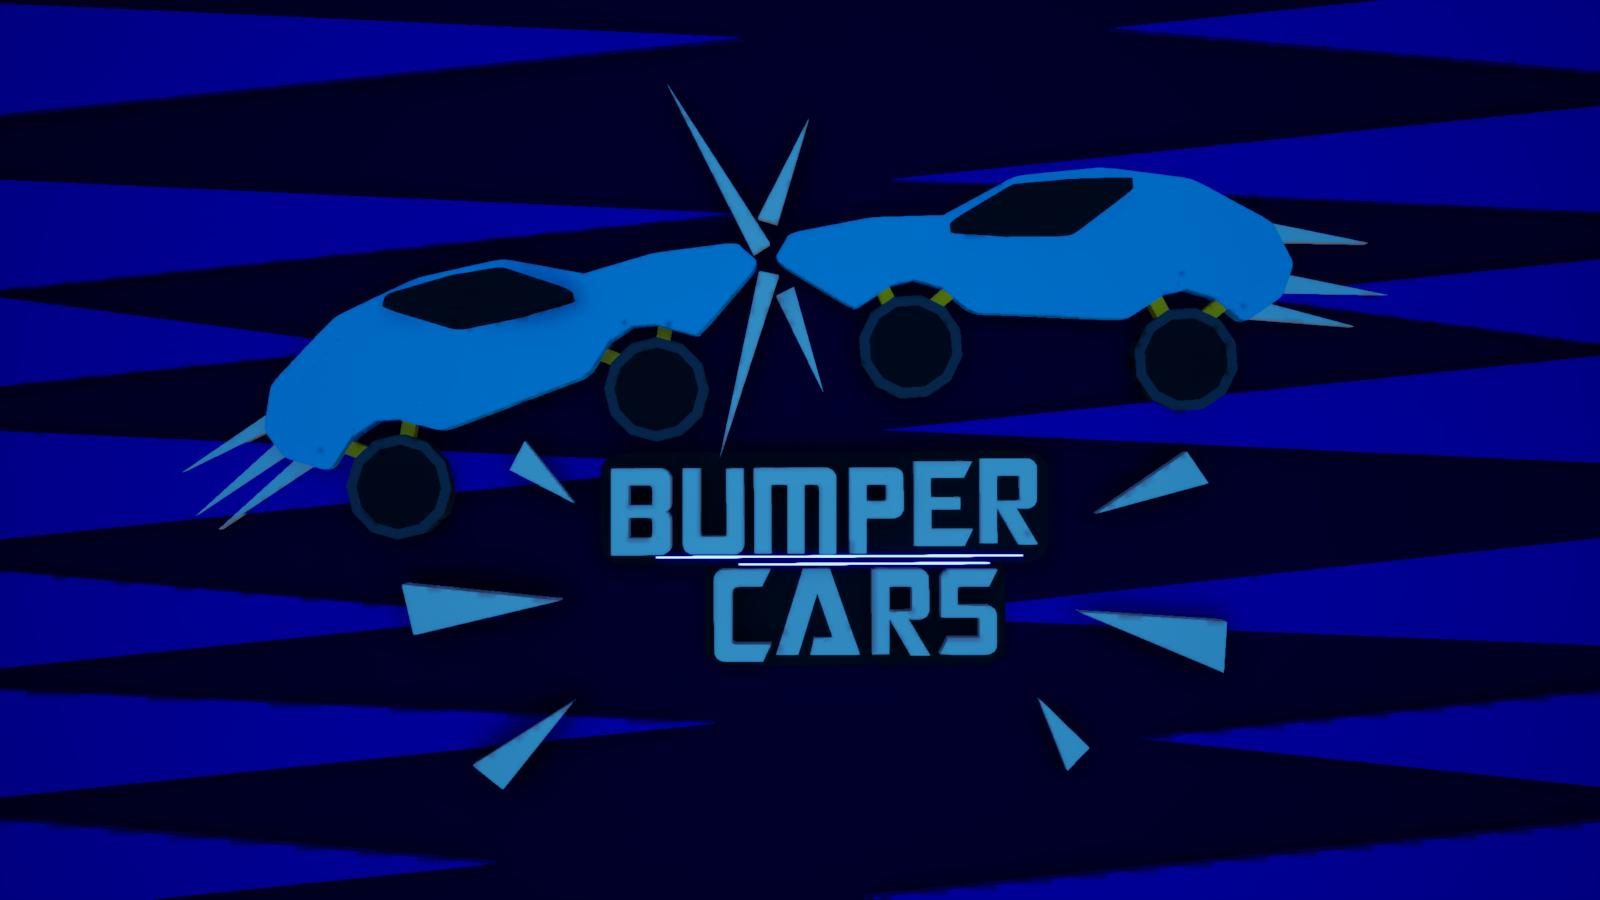 🏎️ 💥 BUMPER CARS 💥🏎️ 7234-6313-9021 by Poka